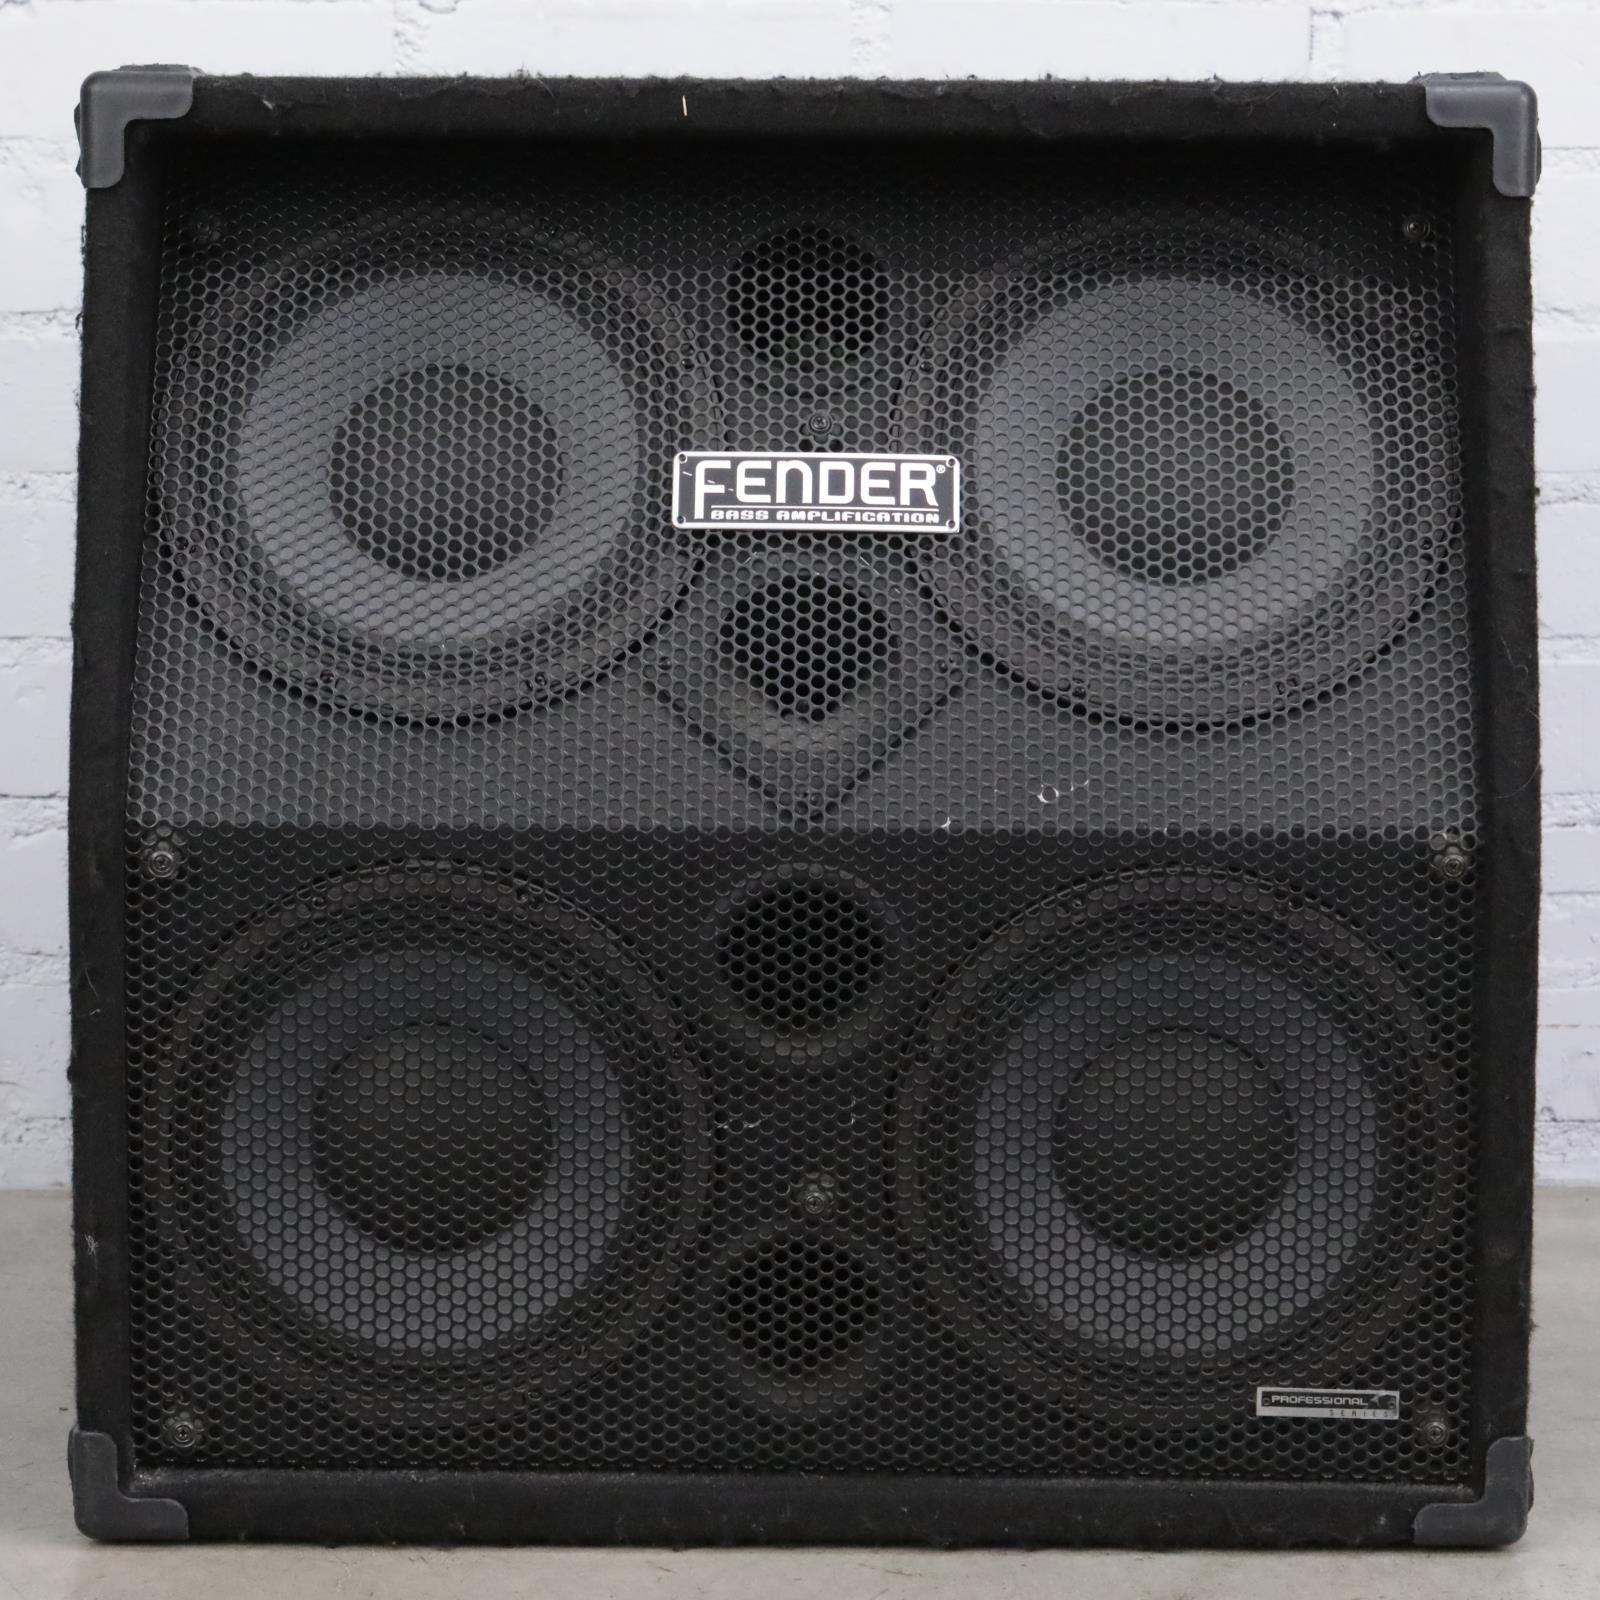 Fender 410 Pro 4x10 Slanted Bass Speaker Cabinet #43087